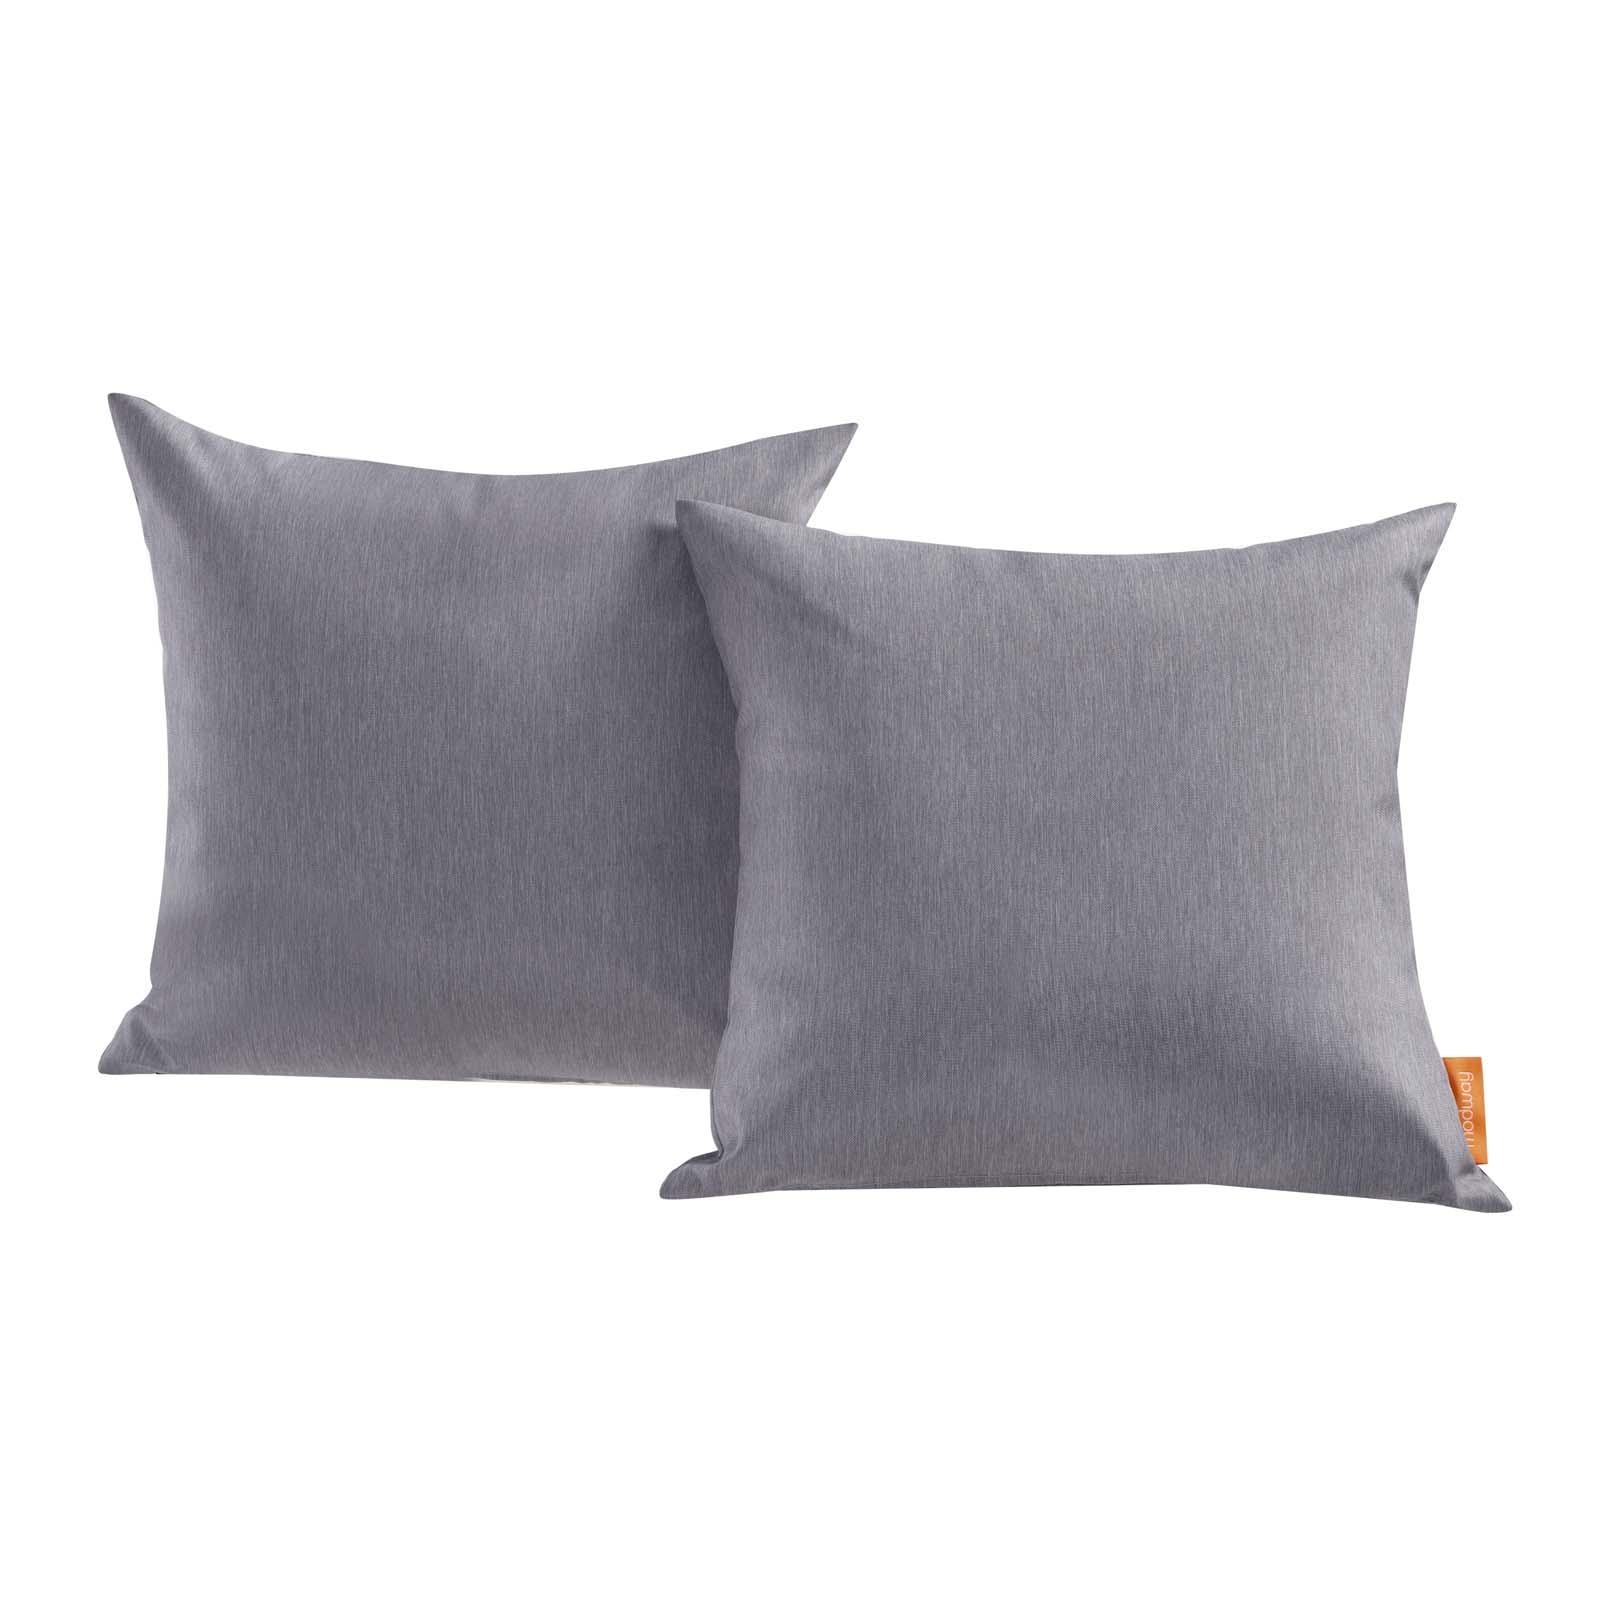 Convene Two Piece Outdoor Patio Pillow Set in Gray